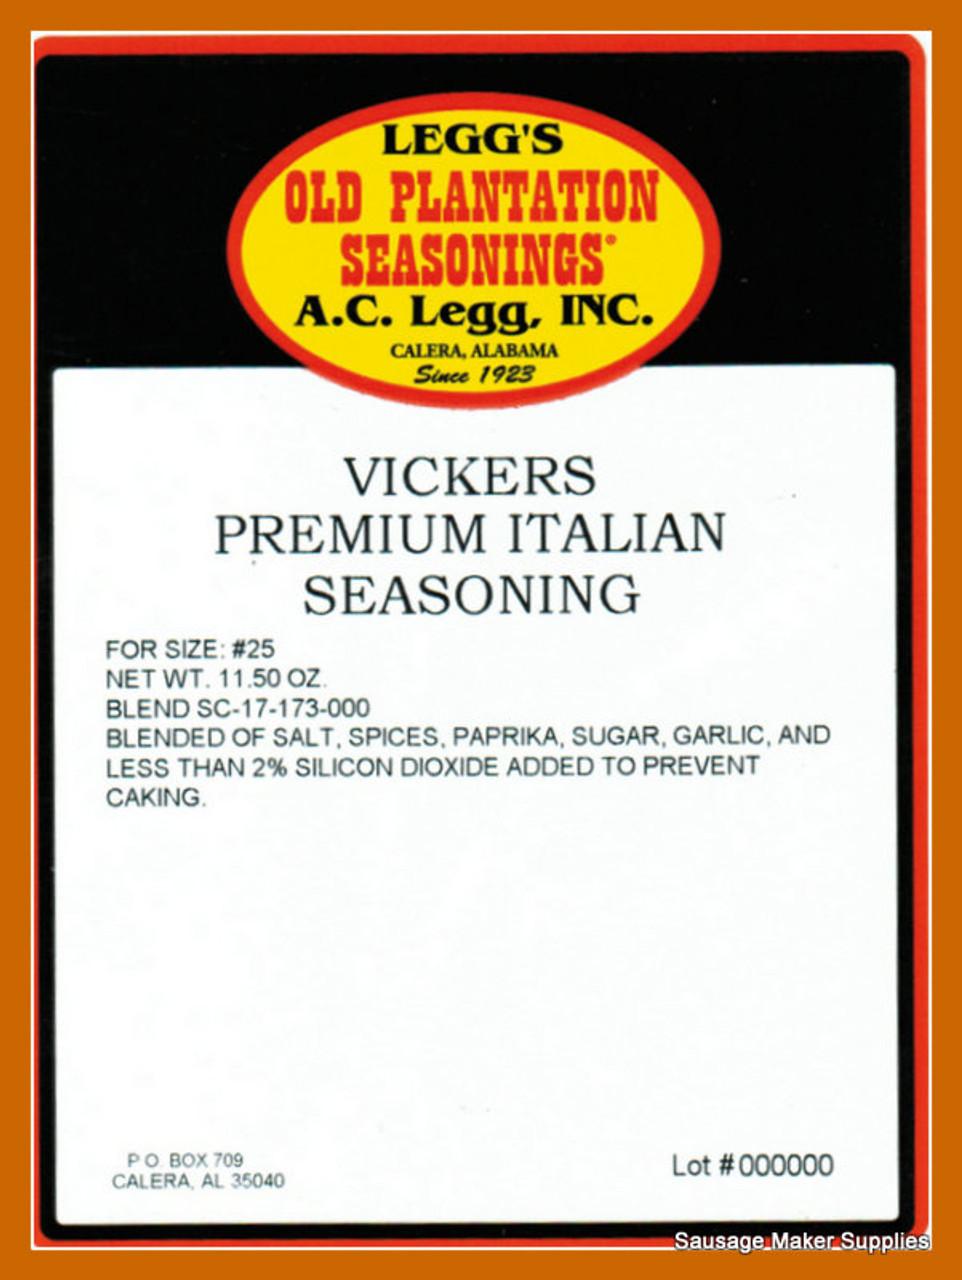 Vickers Premium Italian Sausage Seasoning